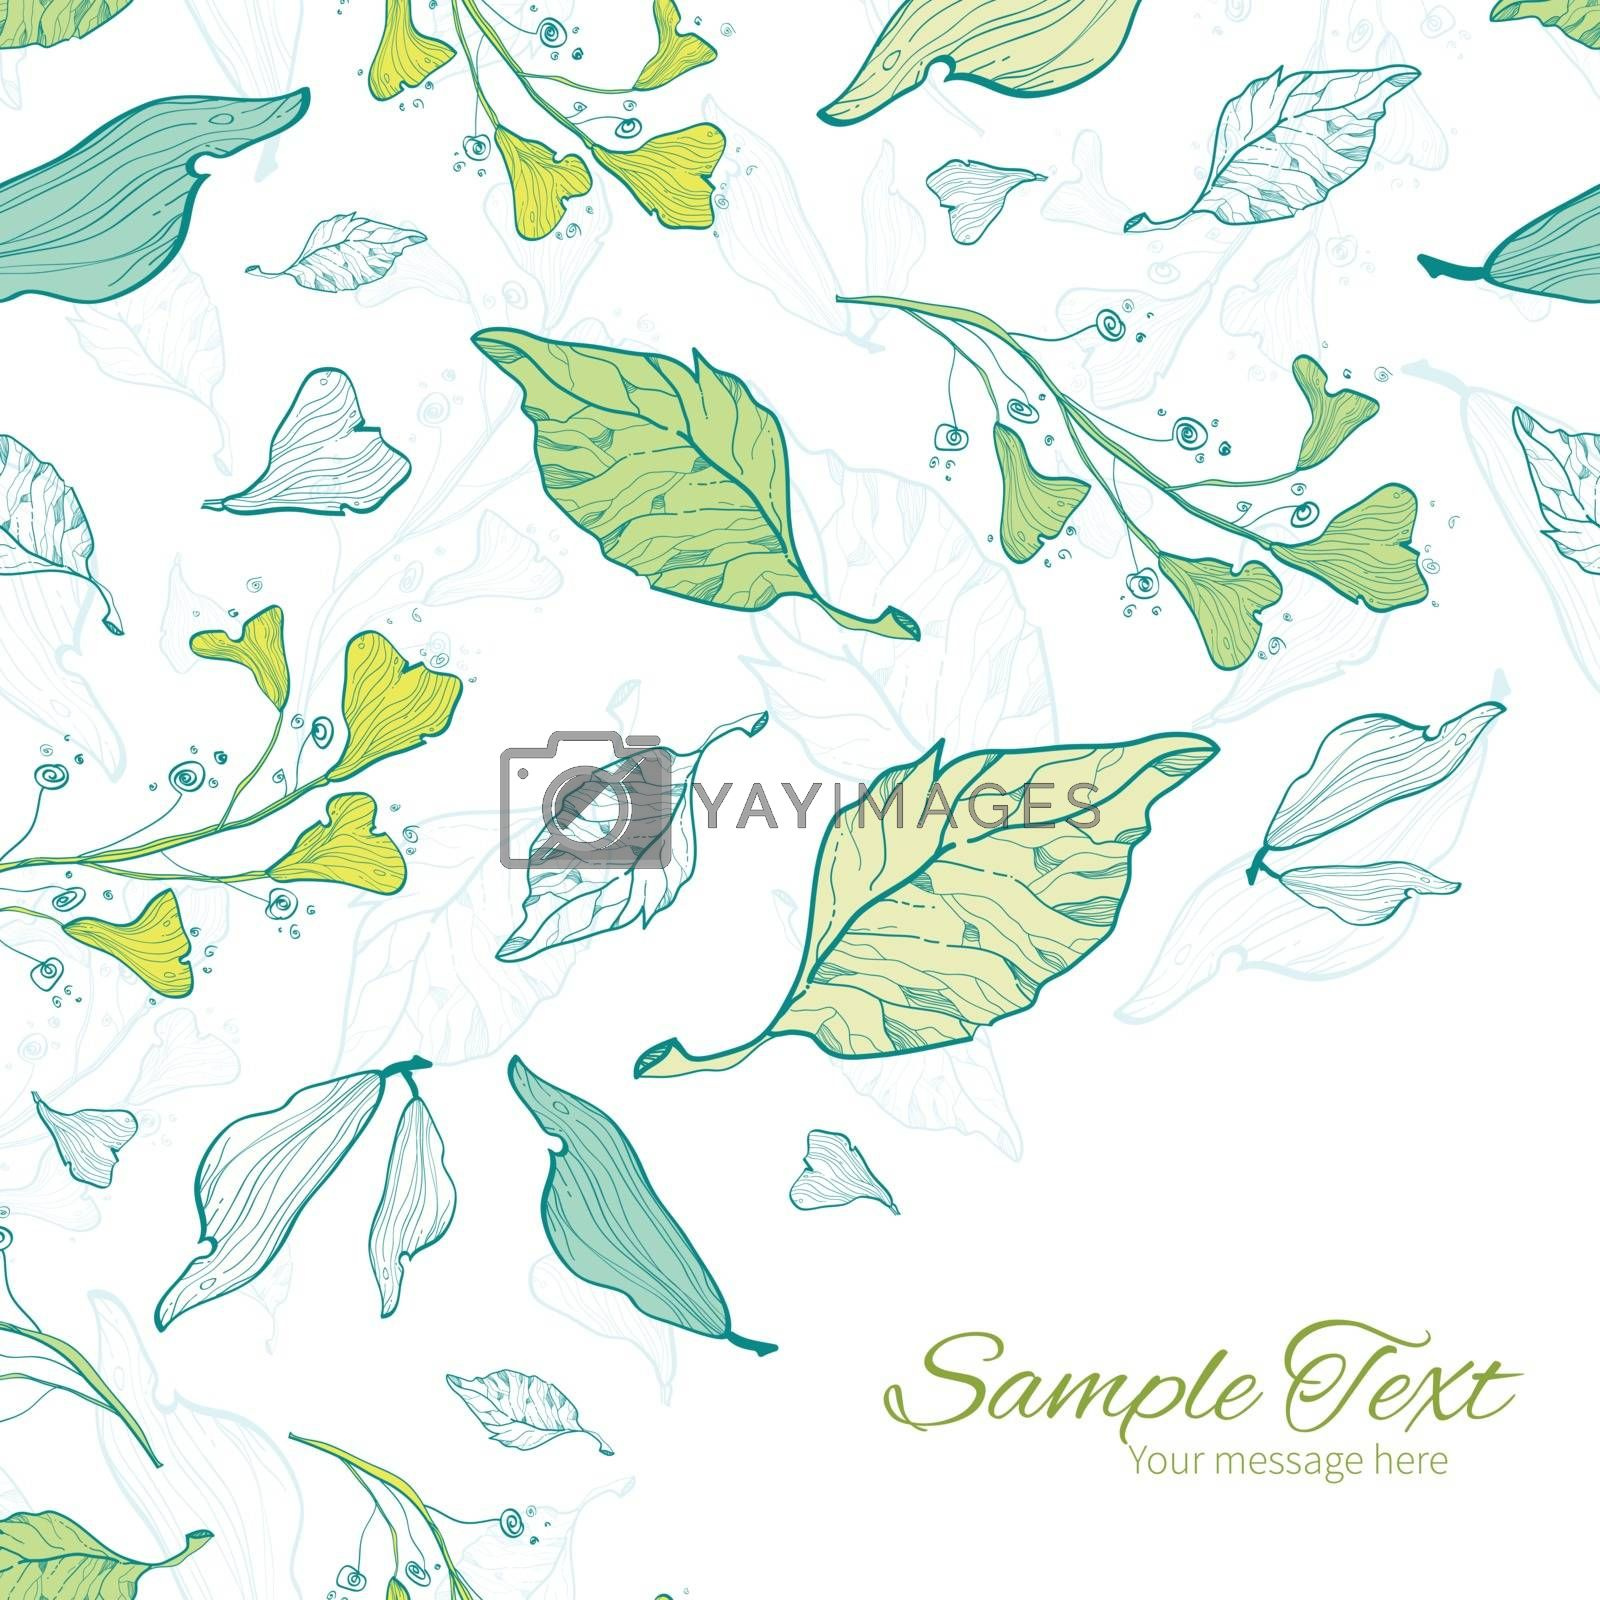 Vector lineart spring leaves frame corner pattern background graphic design